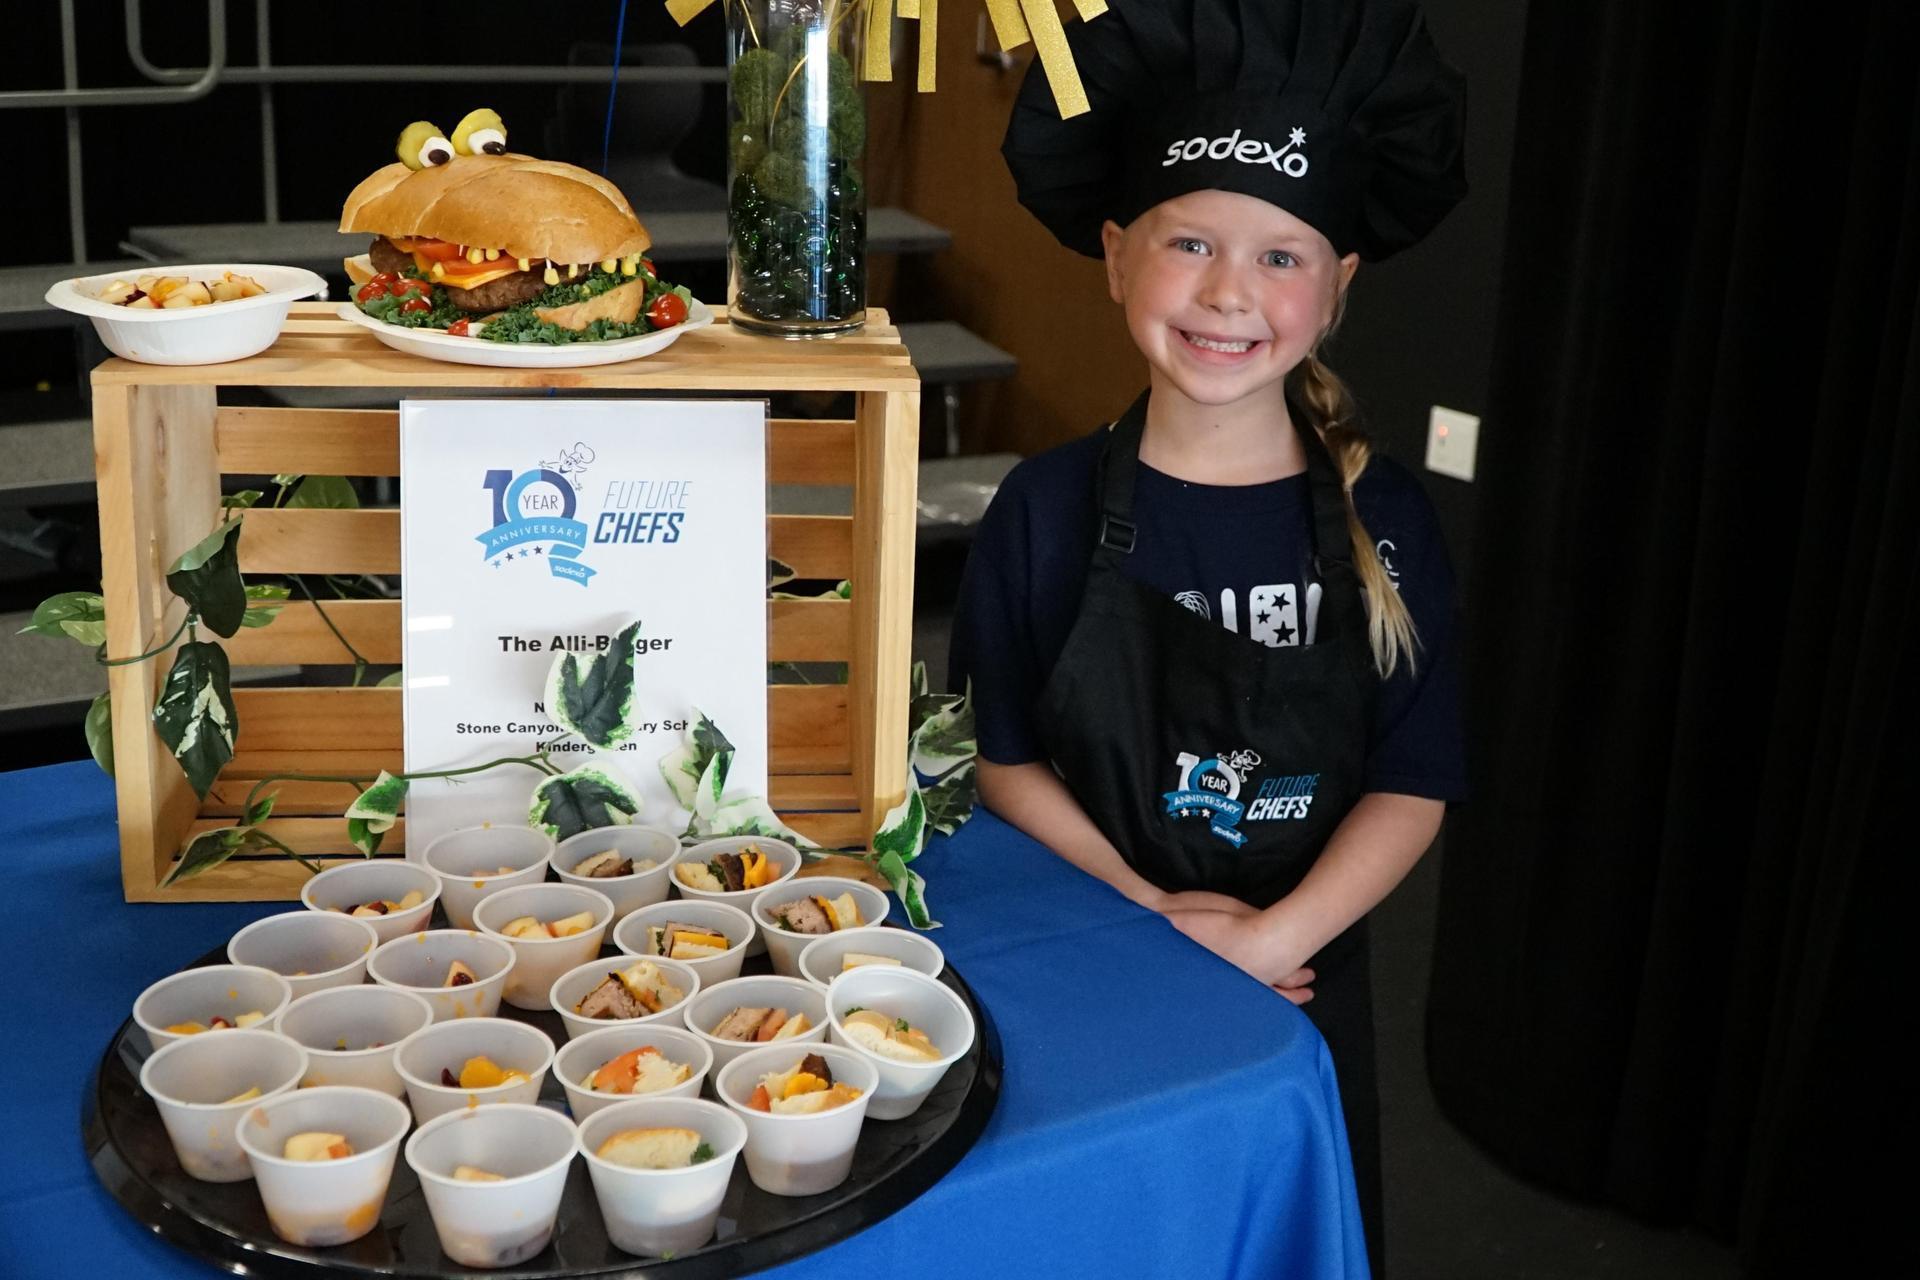 Child Chef Image